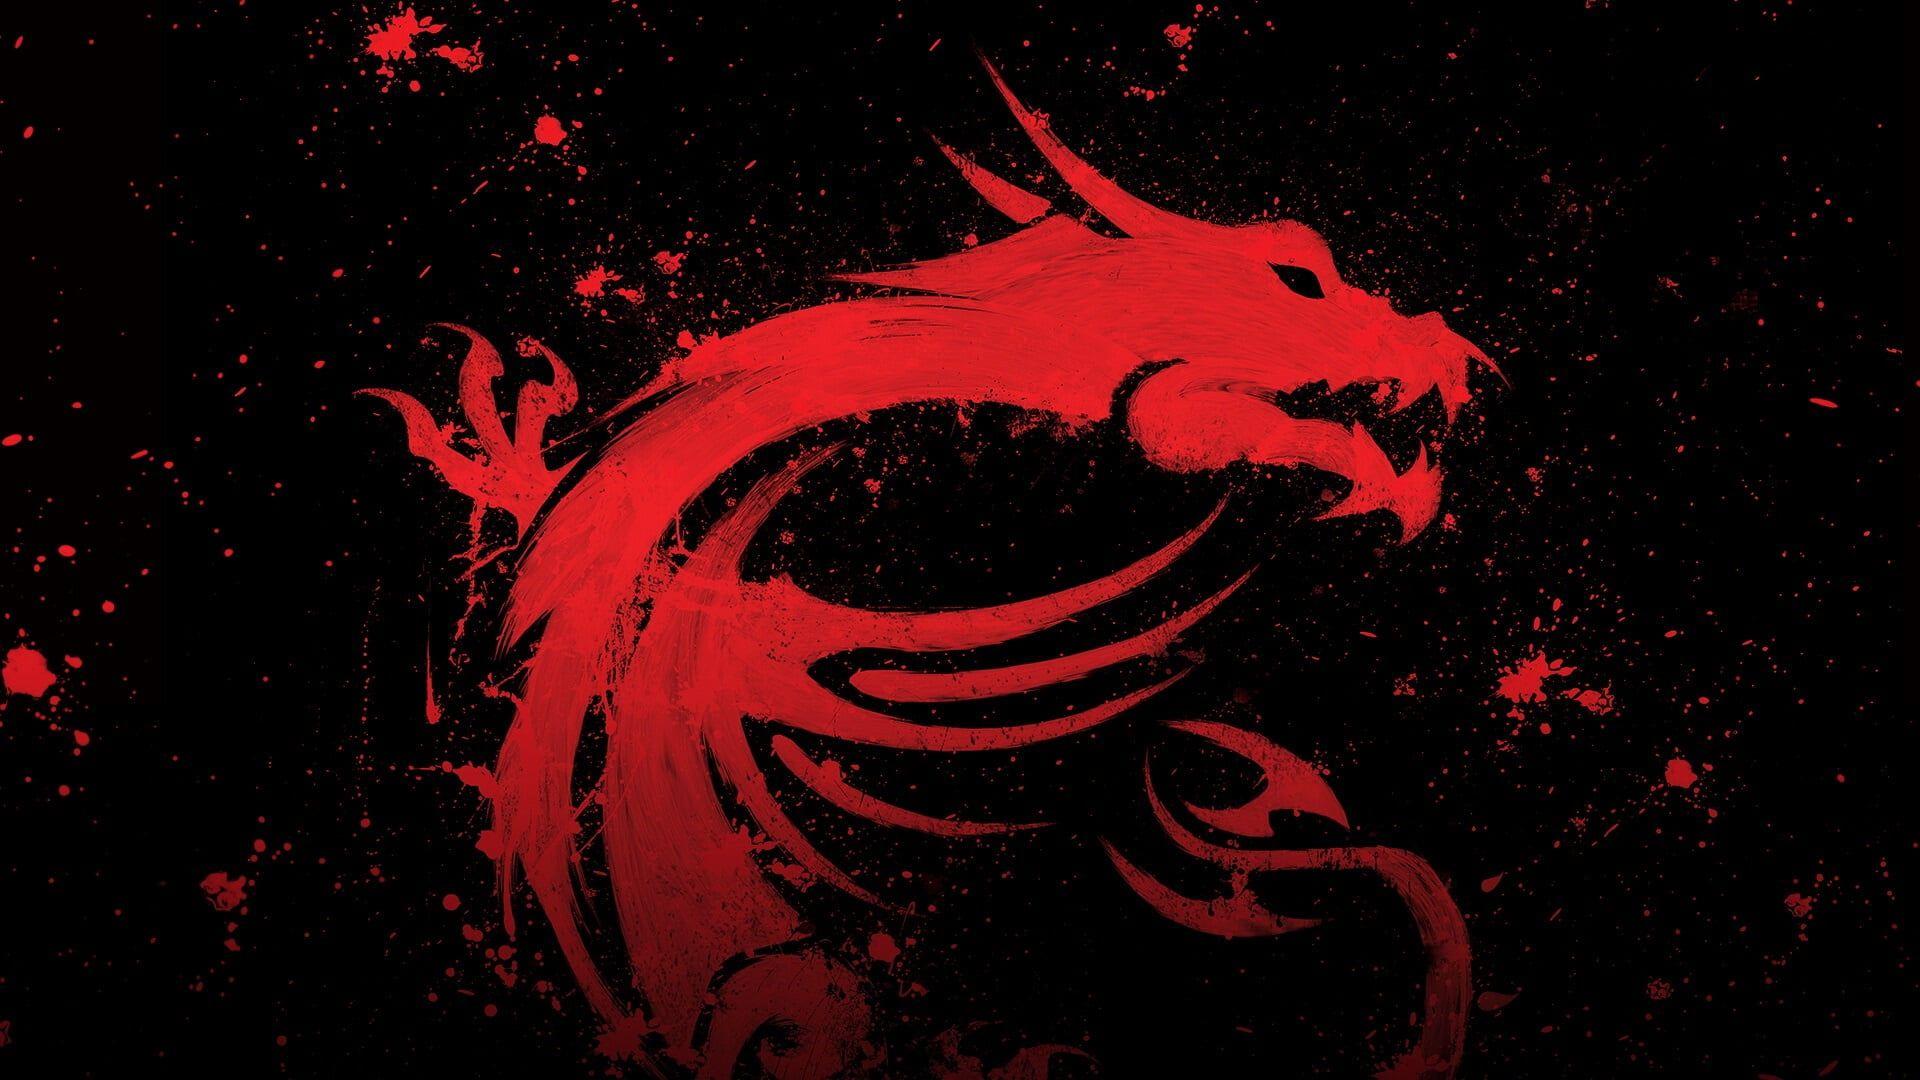 Red Dragon Wallpaper Dragon Msi Micro Star International 1080p Wallpaper Hdwallpape In 2021 Gaming Wallpapers Hd Iphone Background Wallpaper Wallpaper Backgrounds